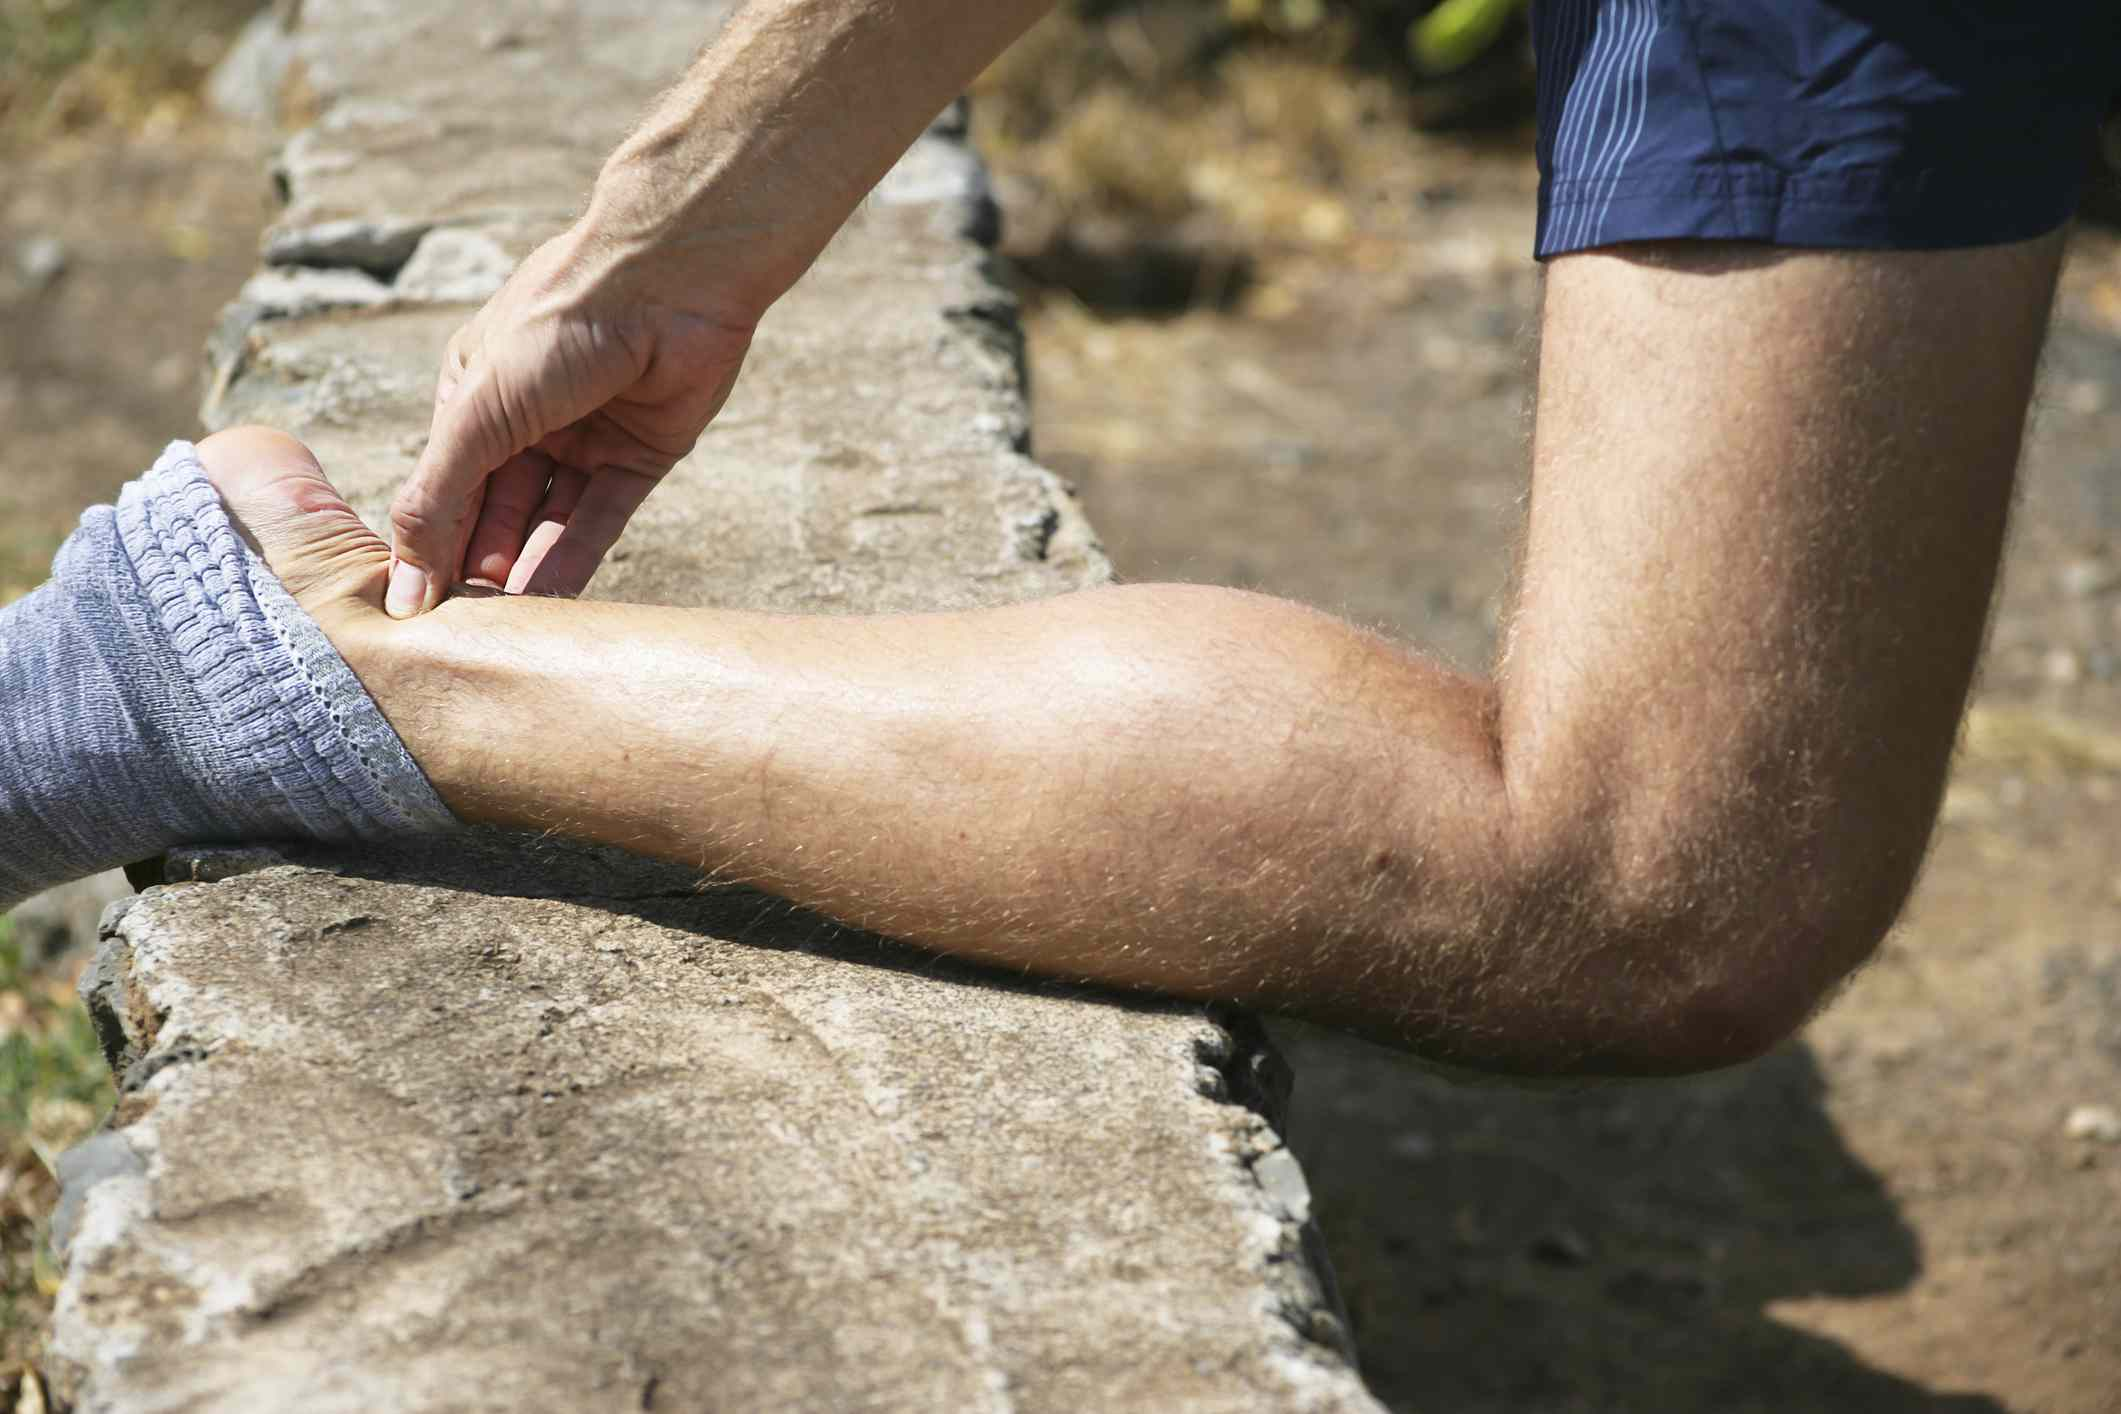 A runner holding his Achilles tendon